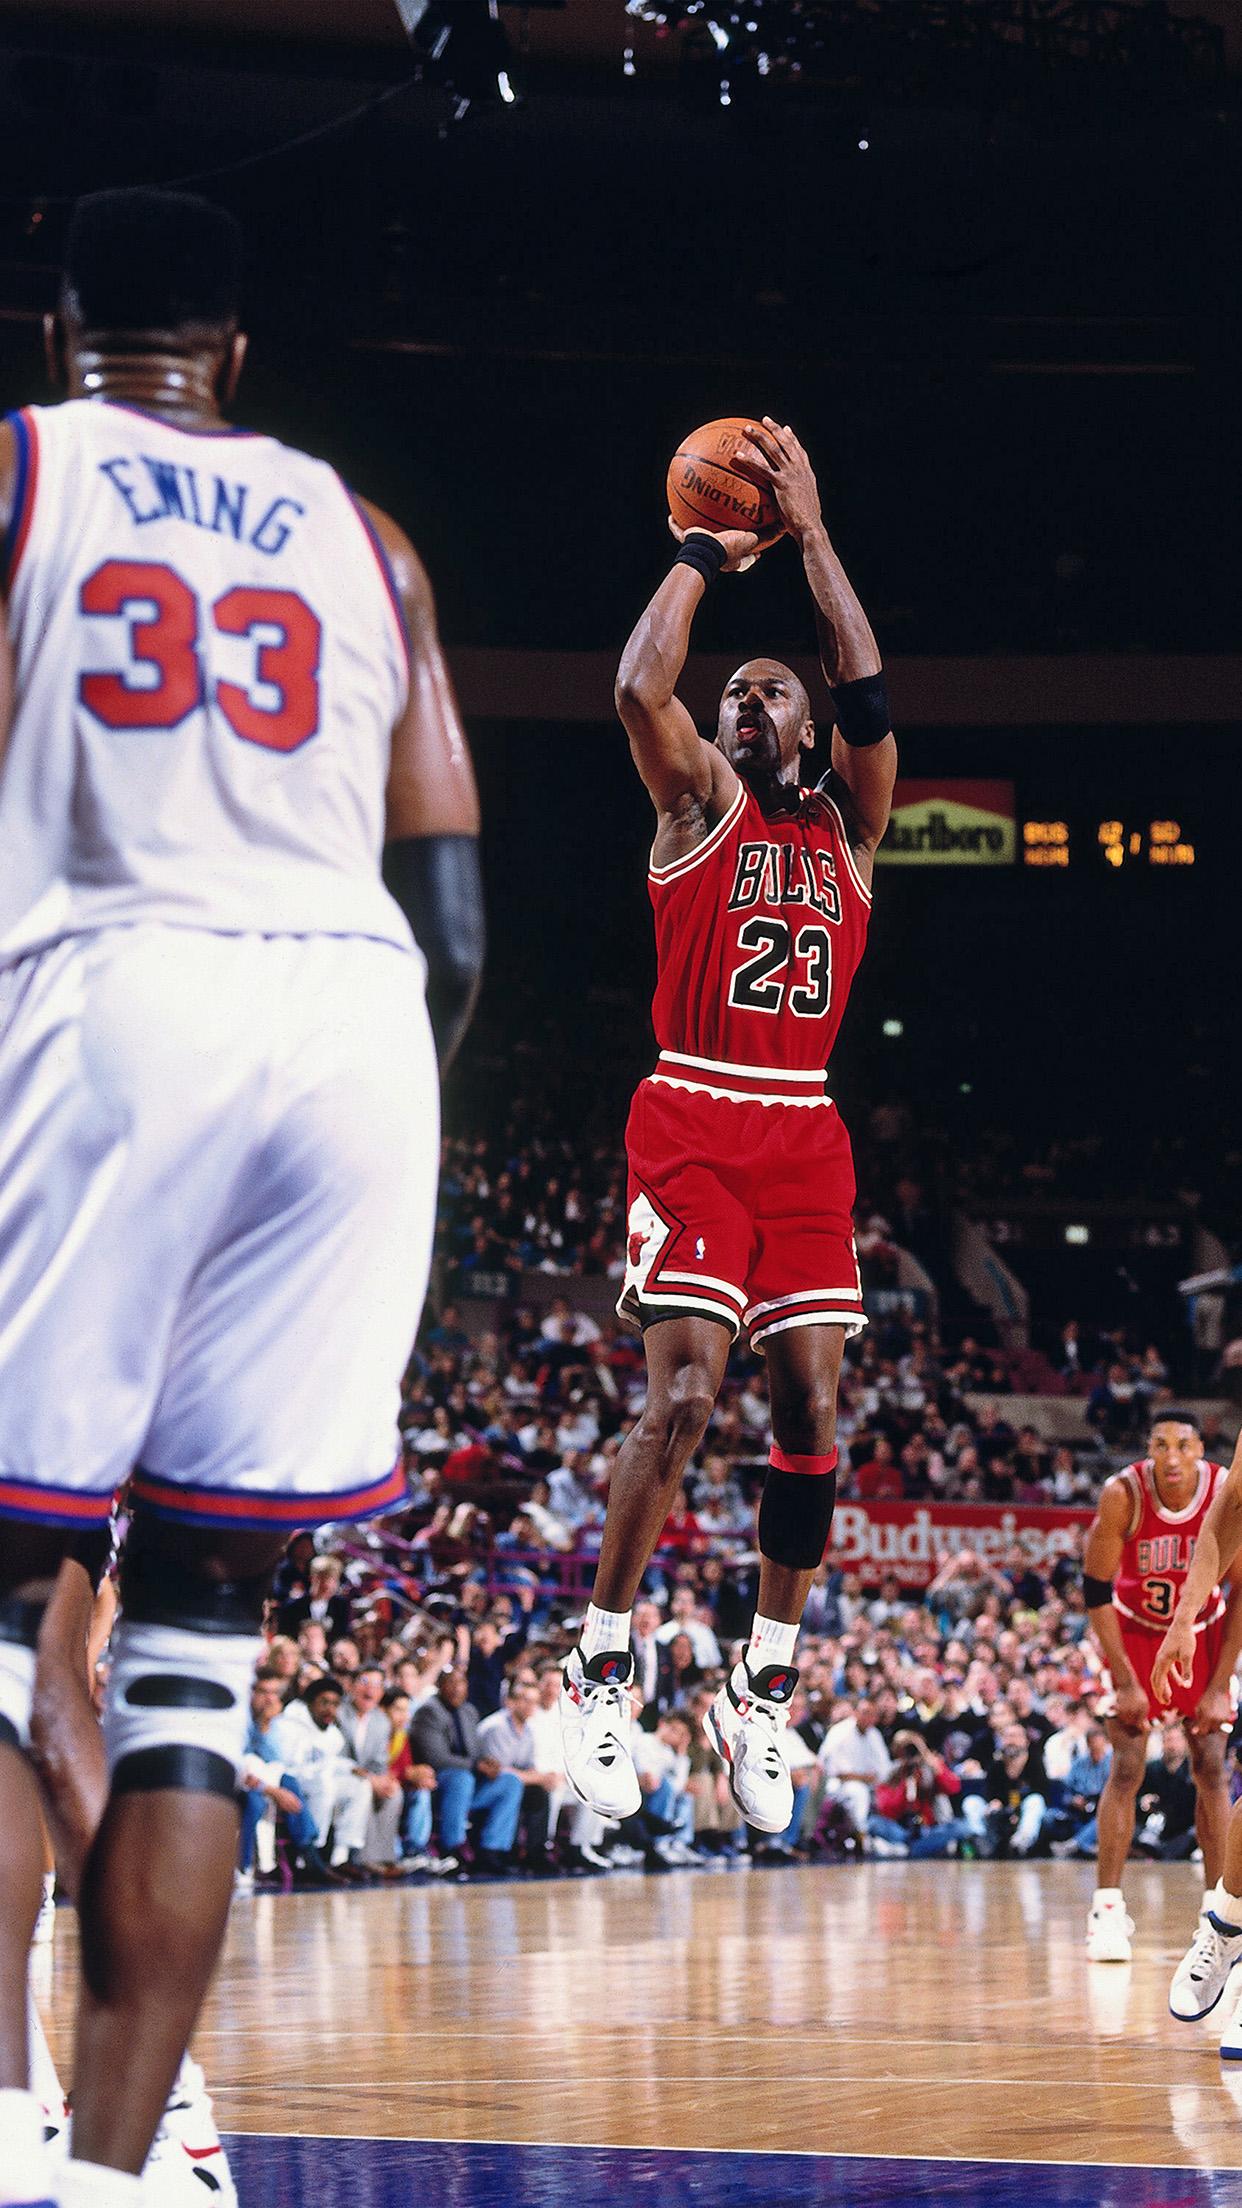 Michael Jordan Wallpaper Iphone 6 Plus Reviewwalls Co